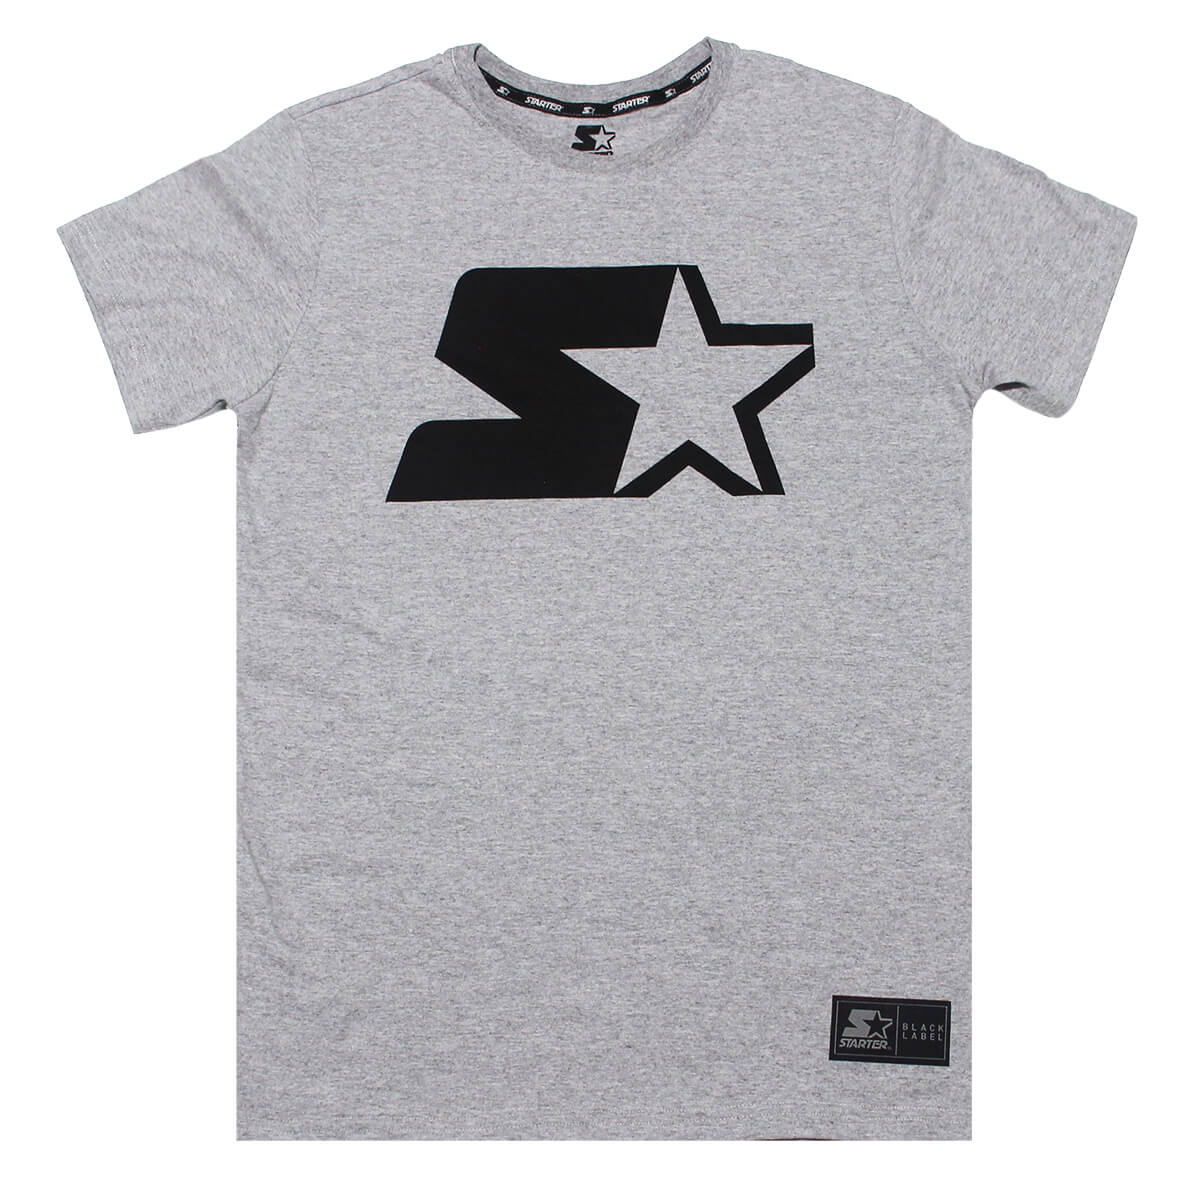 Camiseta Starter Basic Colors Cinza